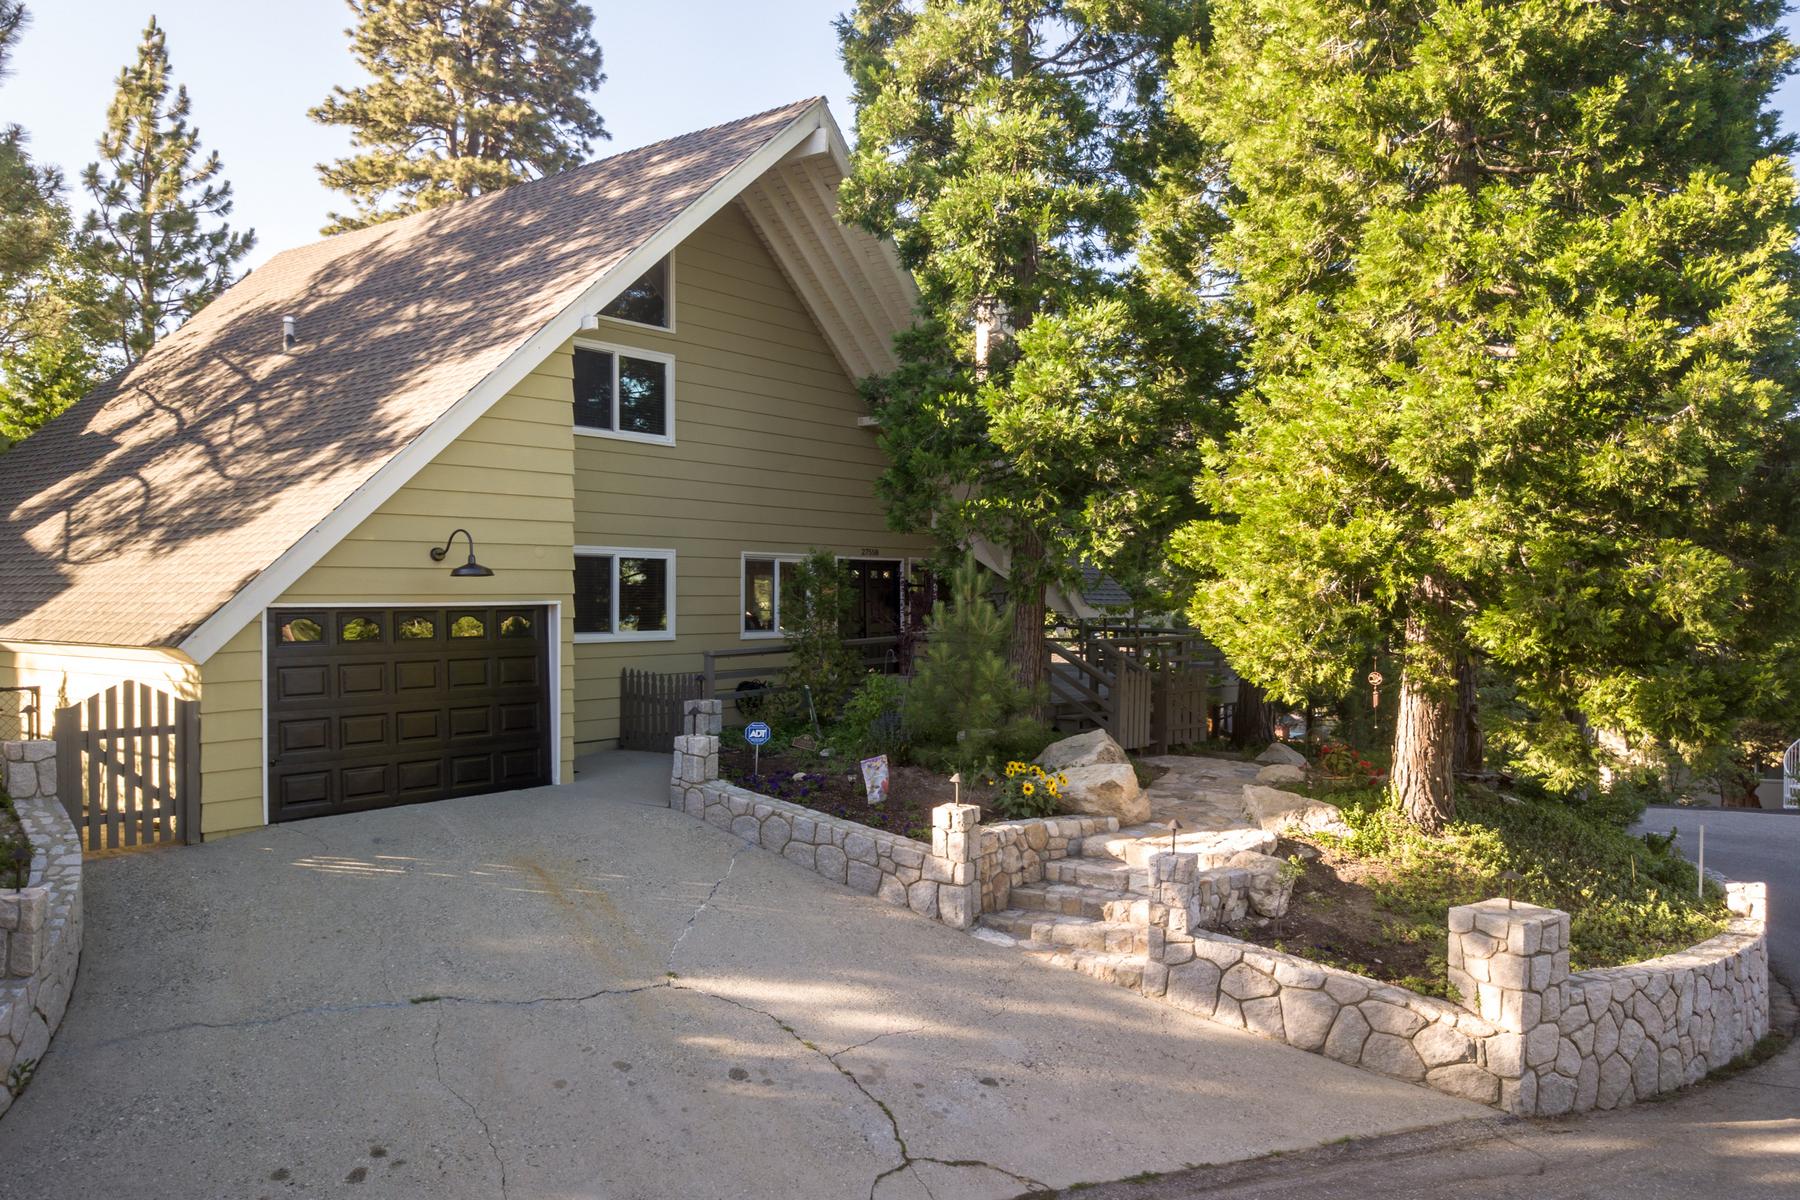 Single Family Homes for Sale at 27558 West Shore Road, Lake Arrowhead, California 92352 27558 West Shore Road Lake Arrowhead, California 92352 United States